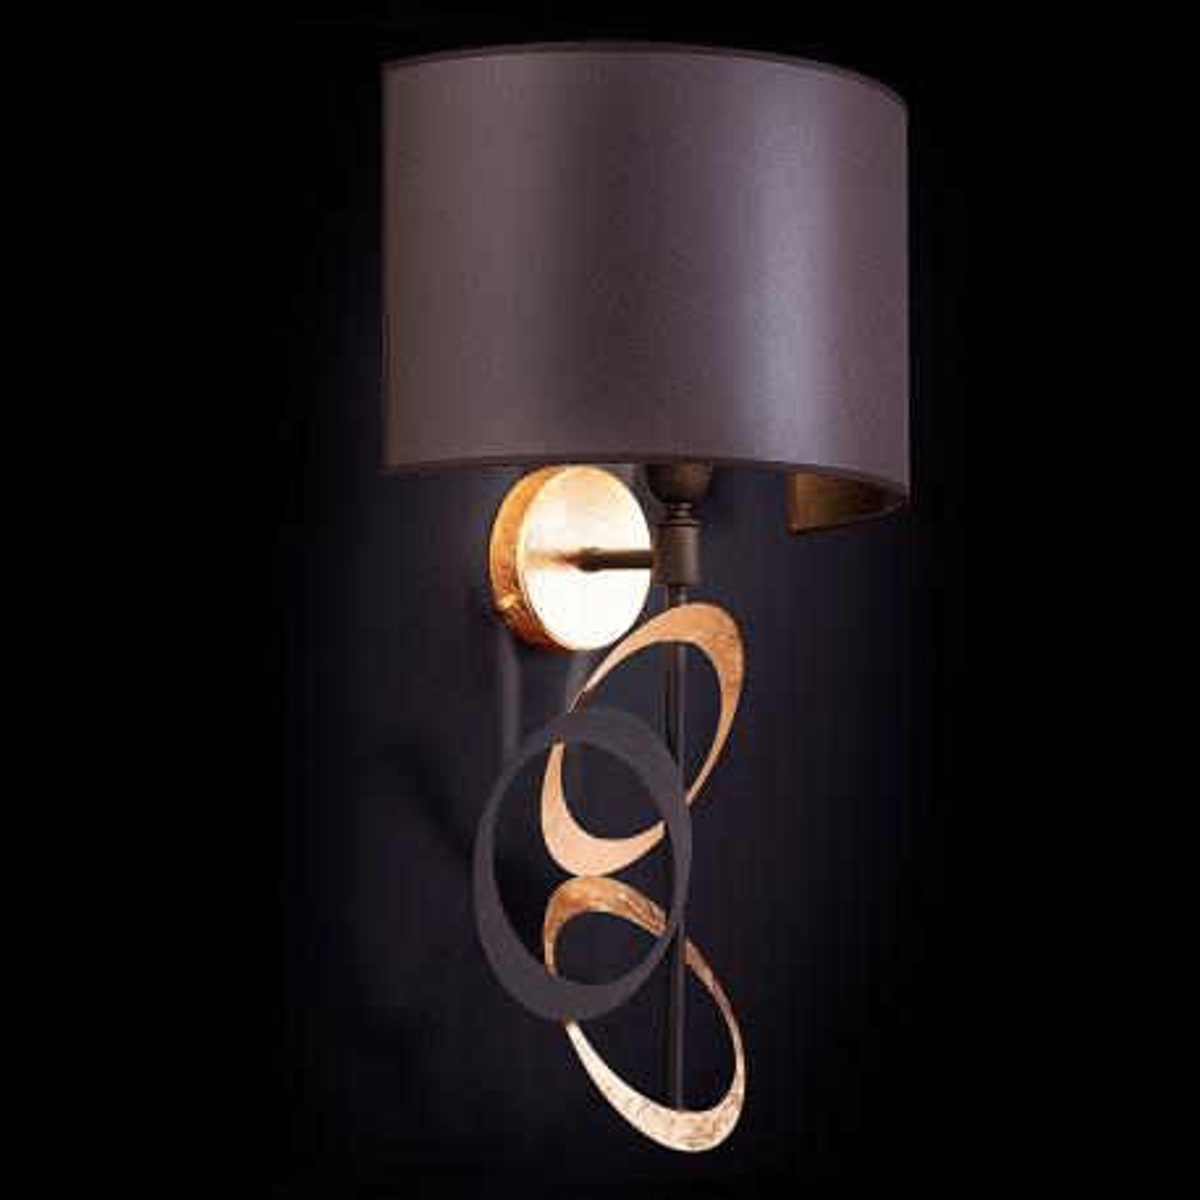 """Canuti"" venetian crystal wall sconce - 1 light - gold leaf"